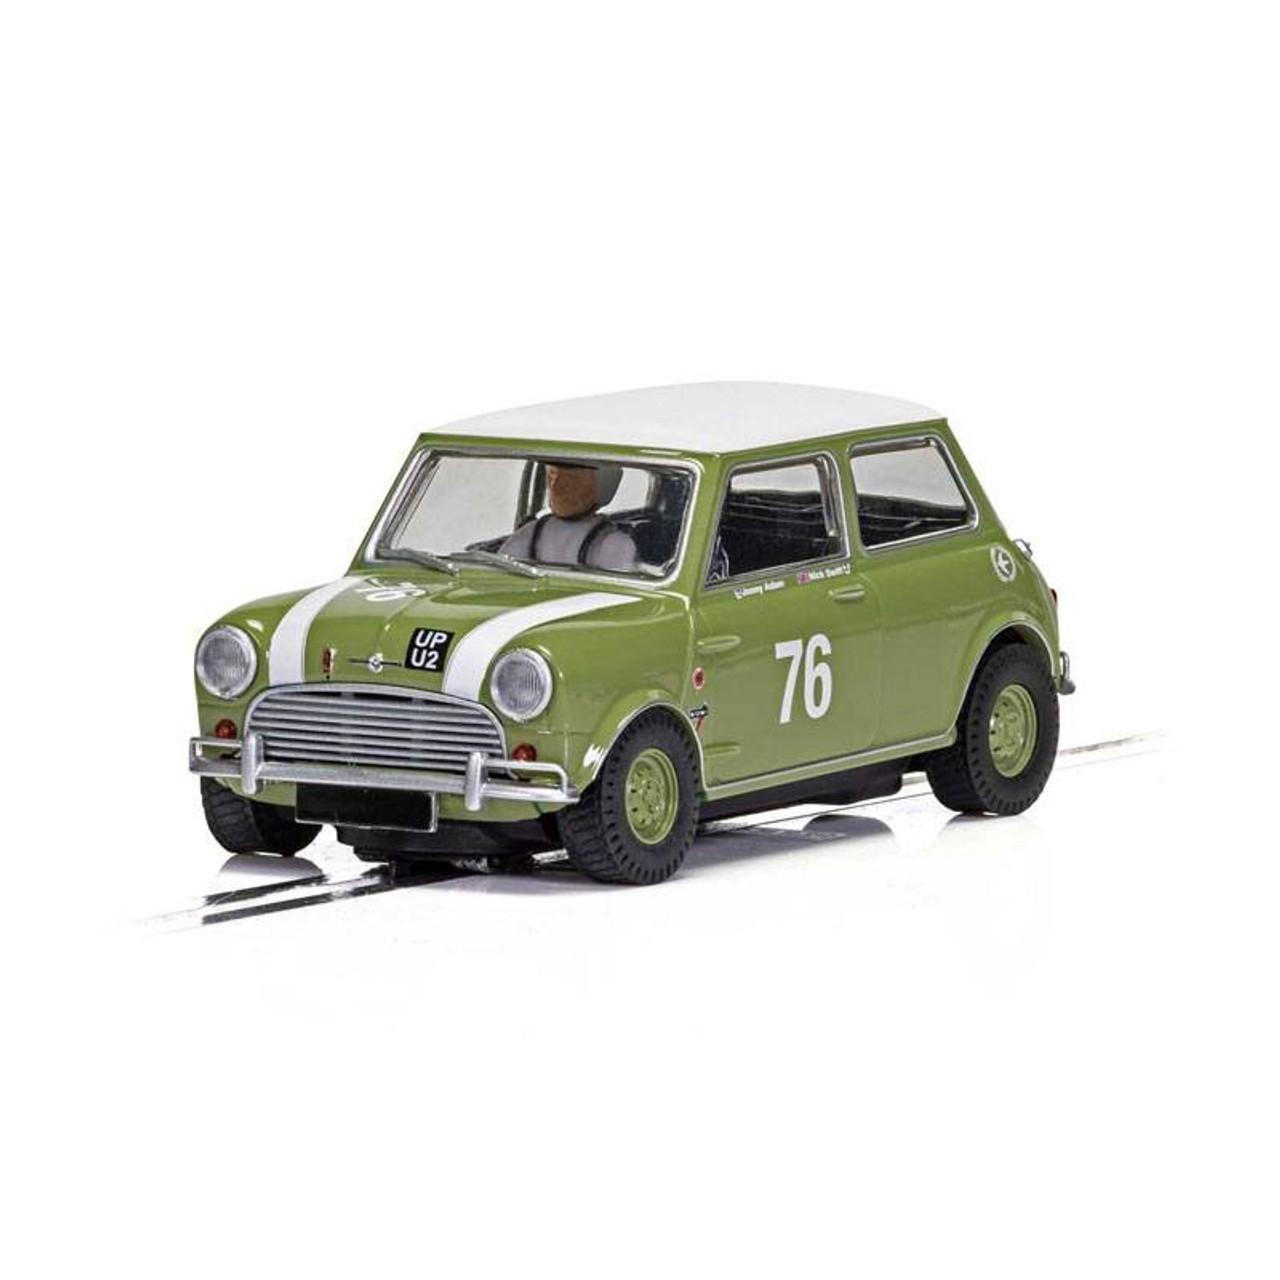 Scalextric 1:32 Scale Mini Countryman WRC Slot Car